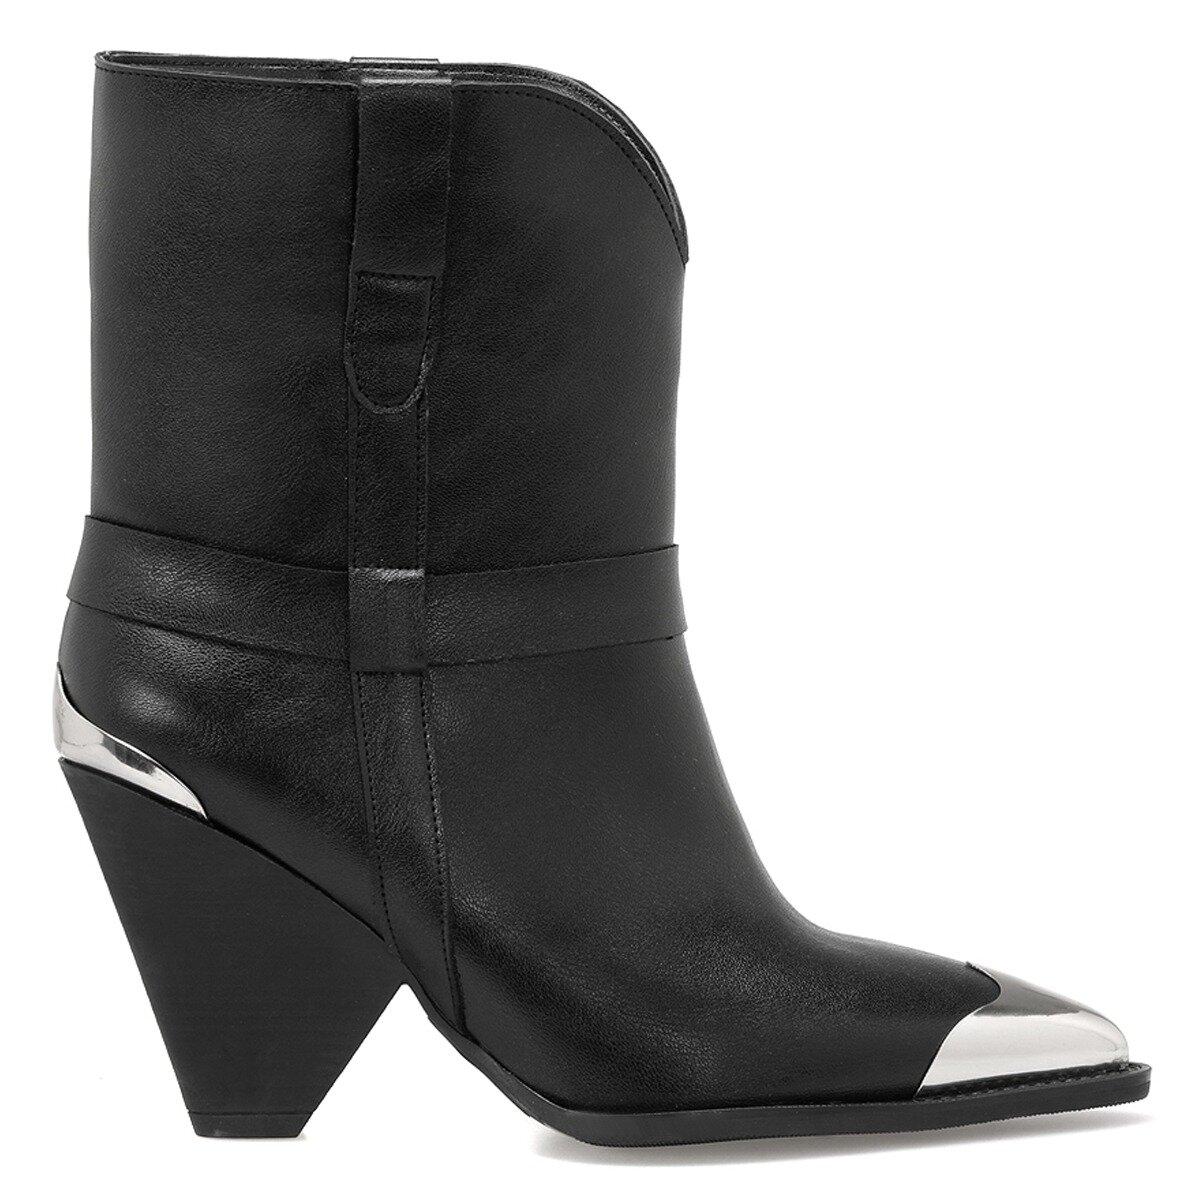 BELLA Siyah Kadın Topuklu Bot